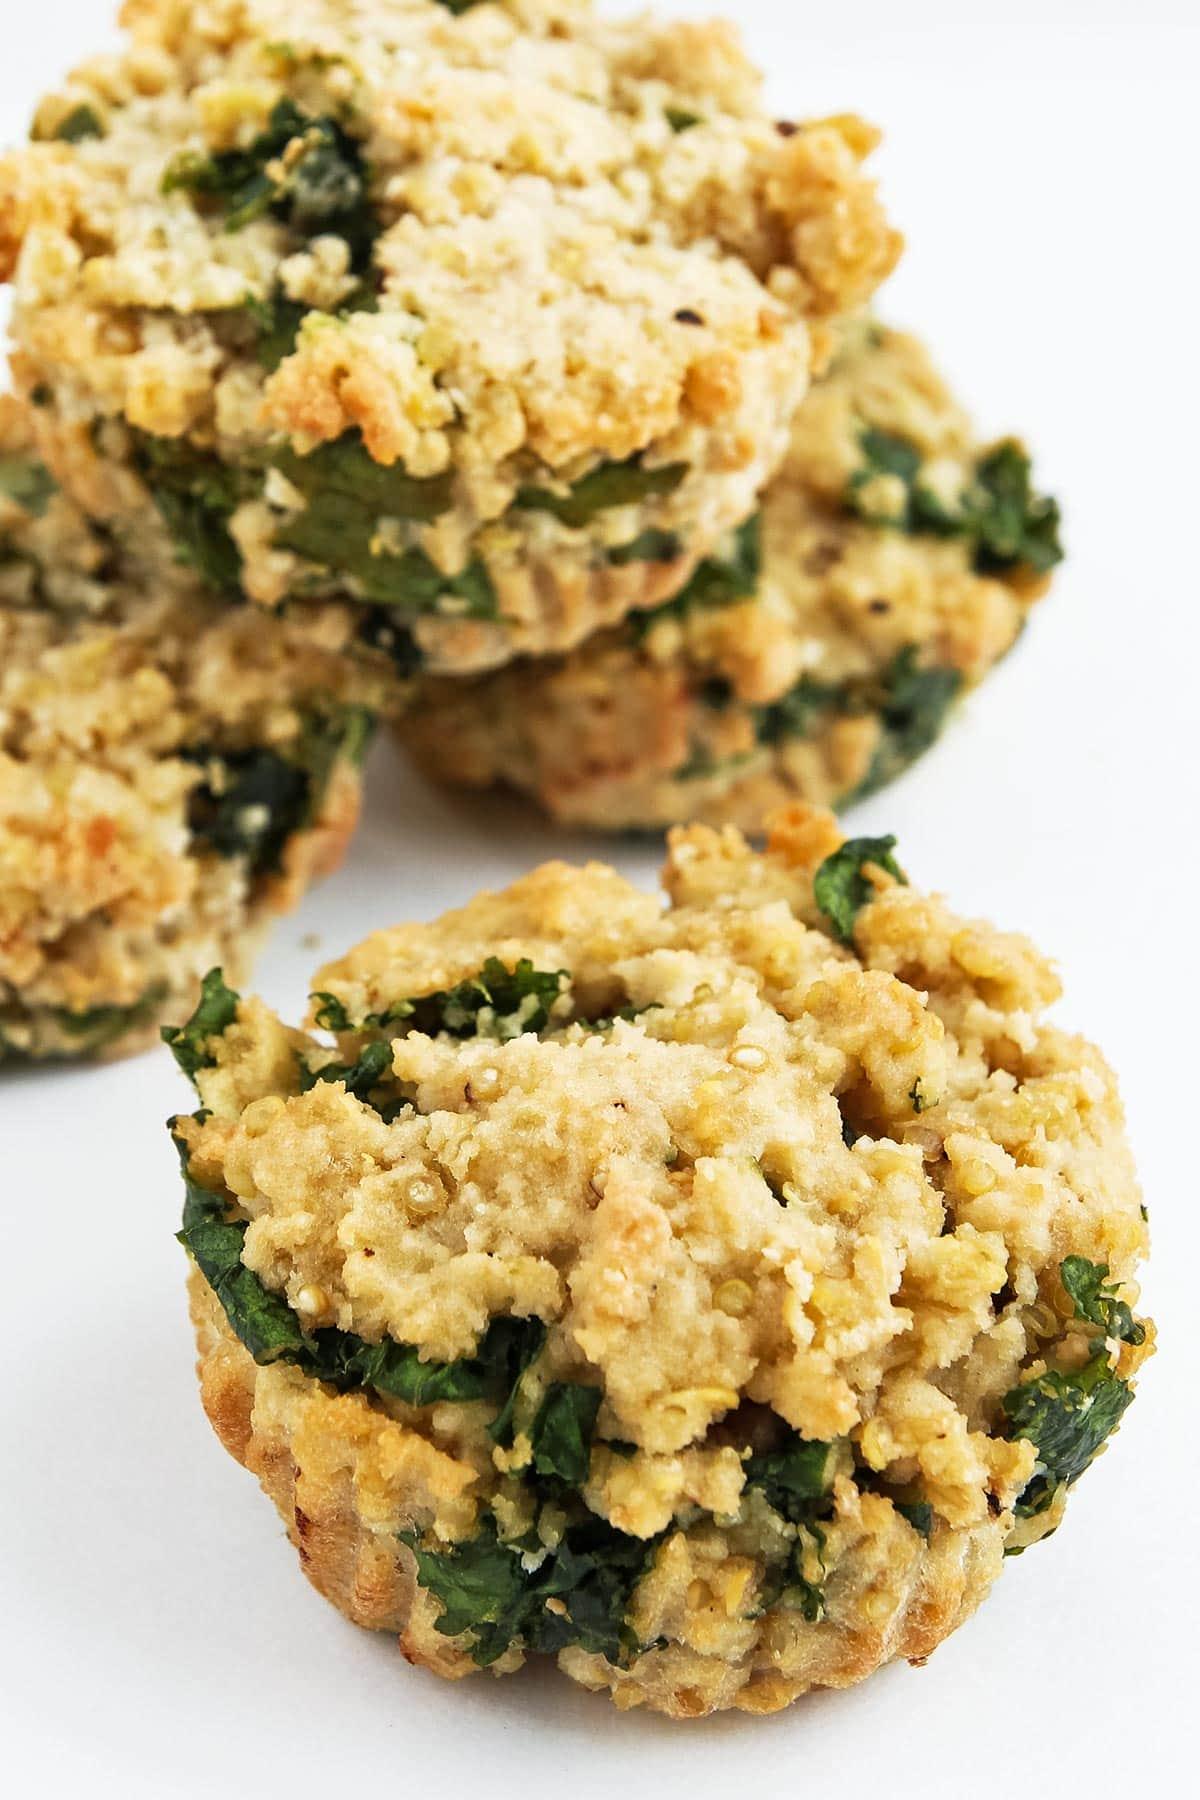 Coconut Flour Quinoa Kale Muffins